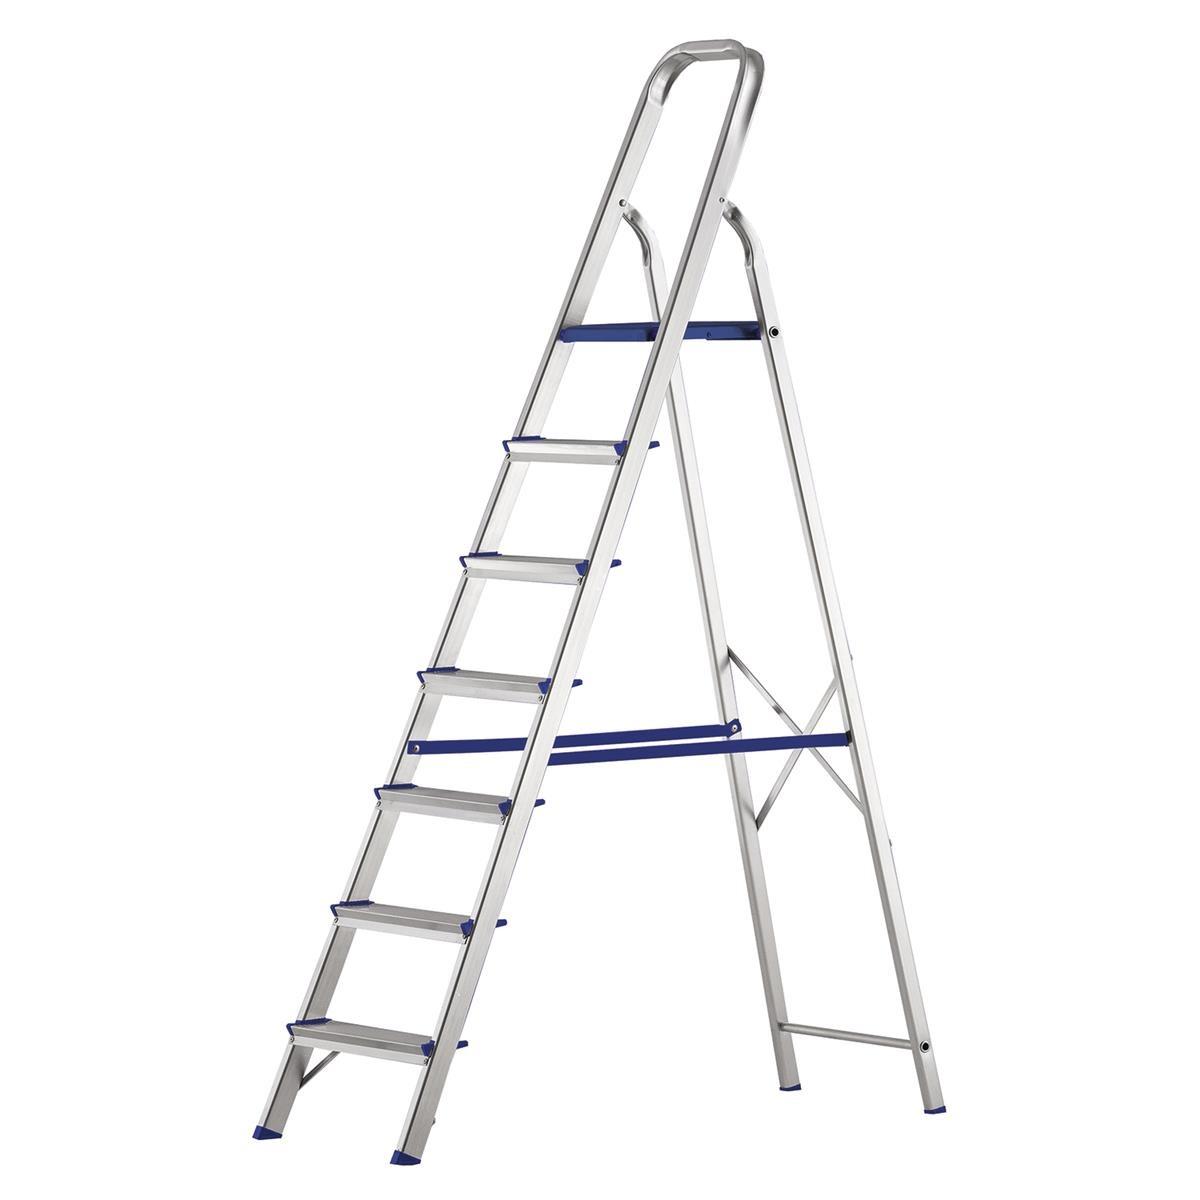 Escada Alumínio Prima 7 Degraus 120 kg